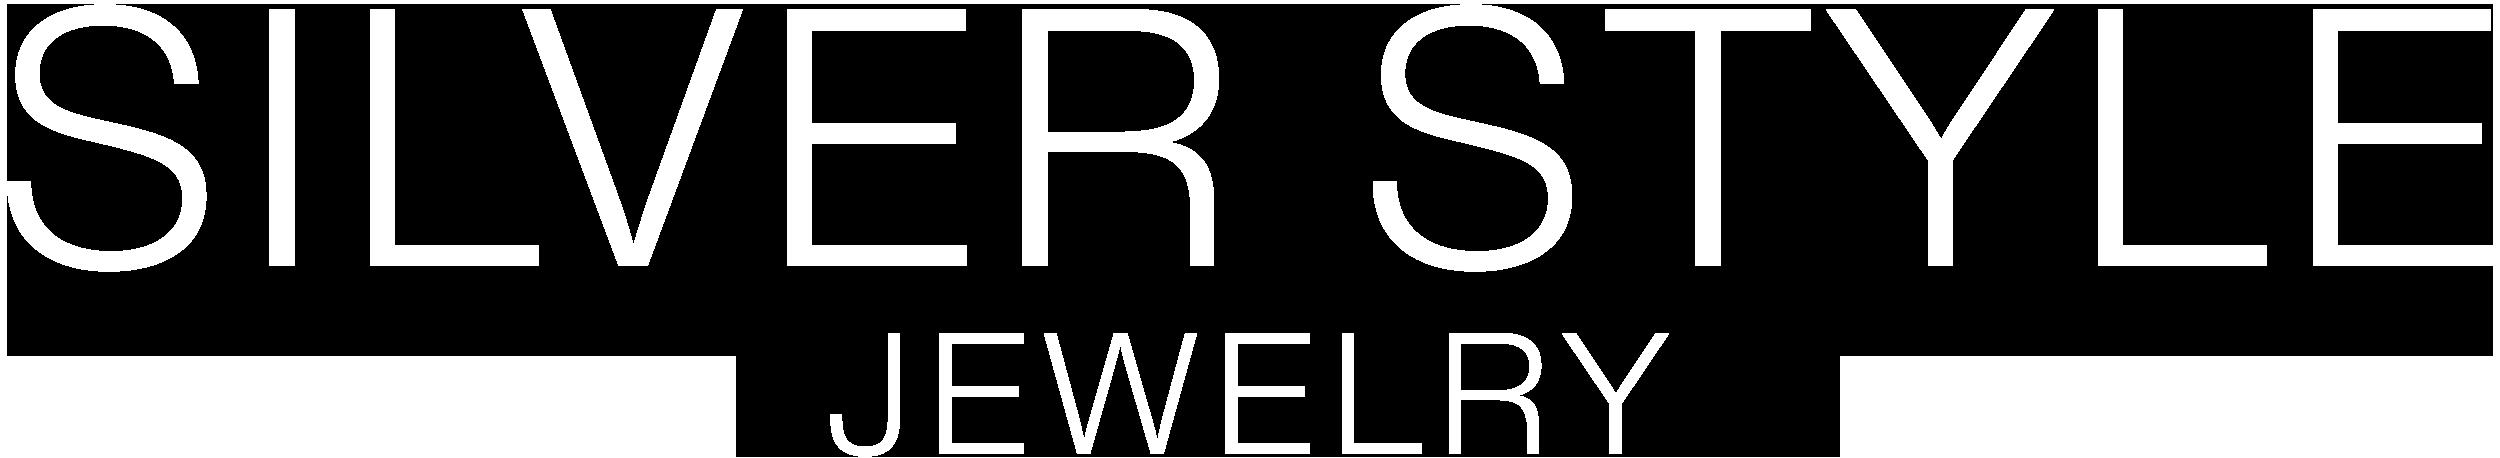 Інтернет магазин  SILVER STYLE